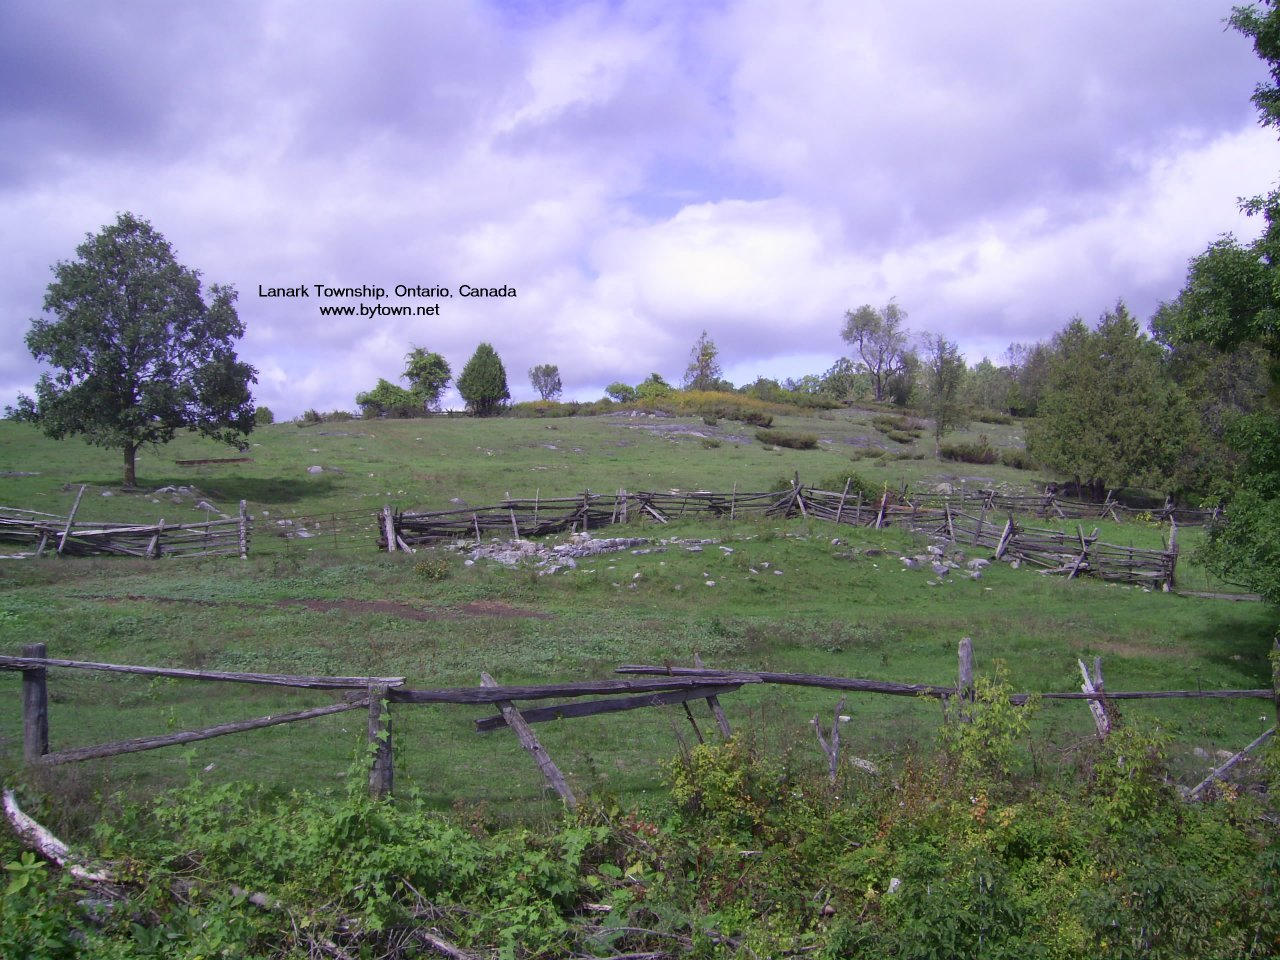 Scene in Lanark Township near Middleville, Ontario